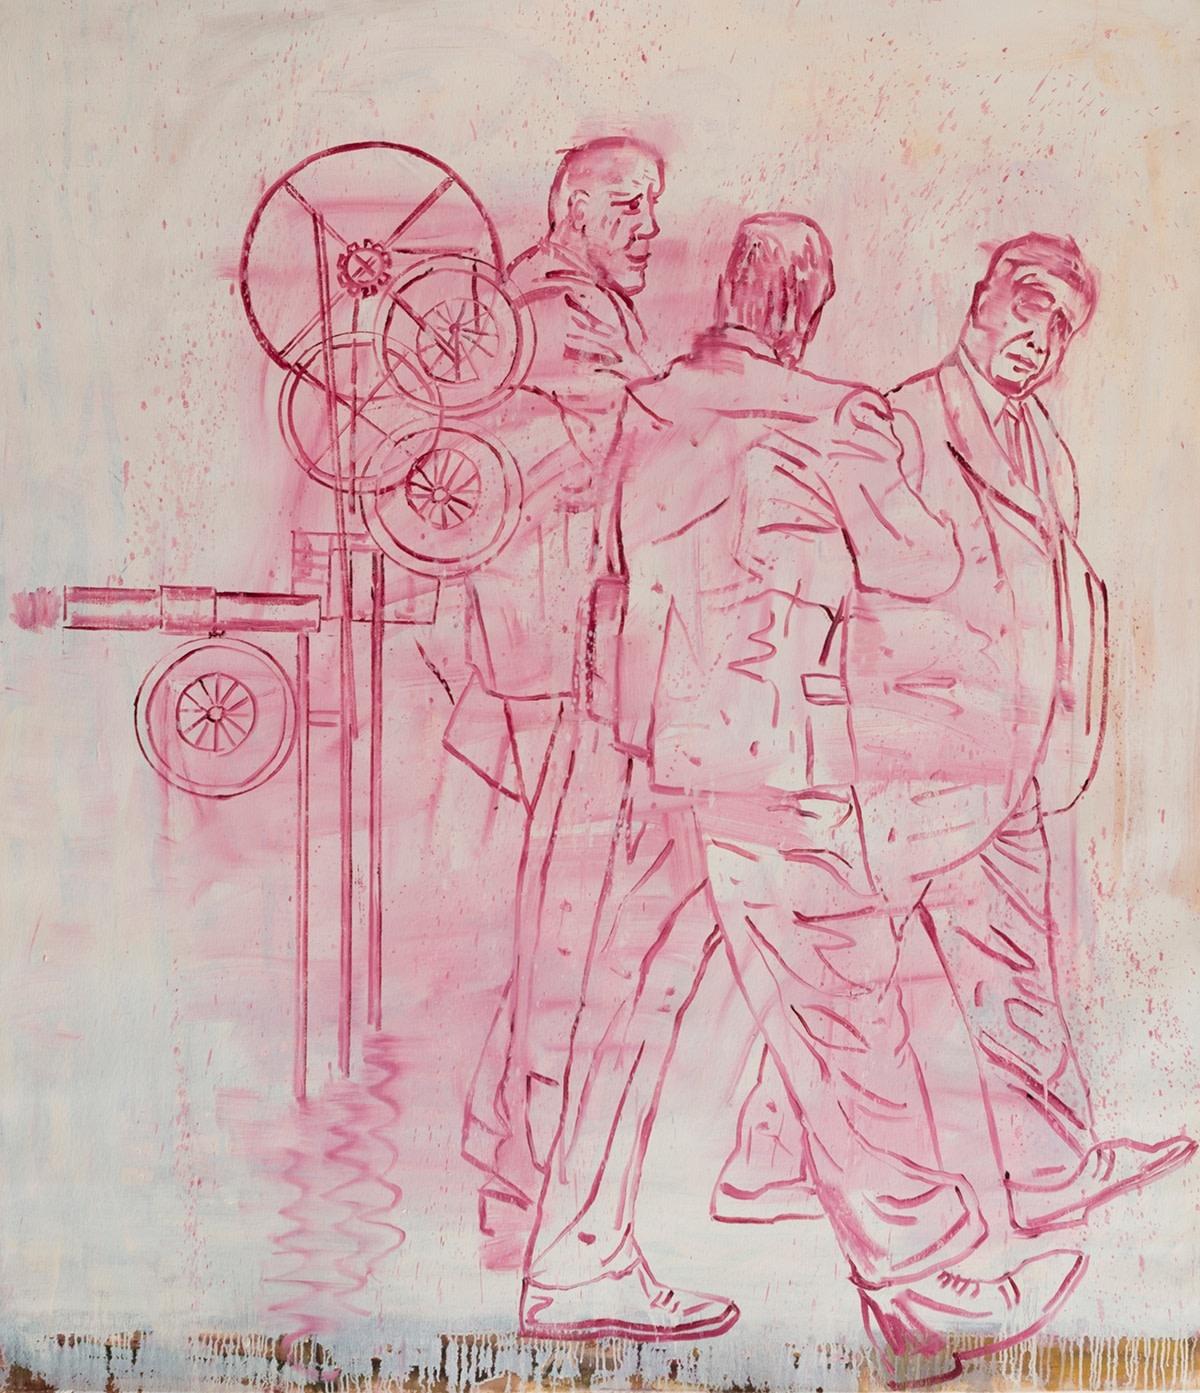 Nicky Nodjoumi Machine Men, 2012 Oil on Canvas 152.4 x 132 cm. / 60 x 52 in.